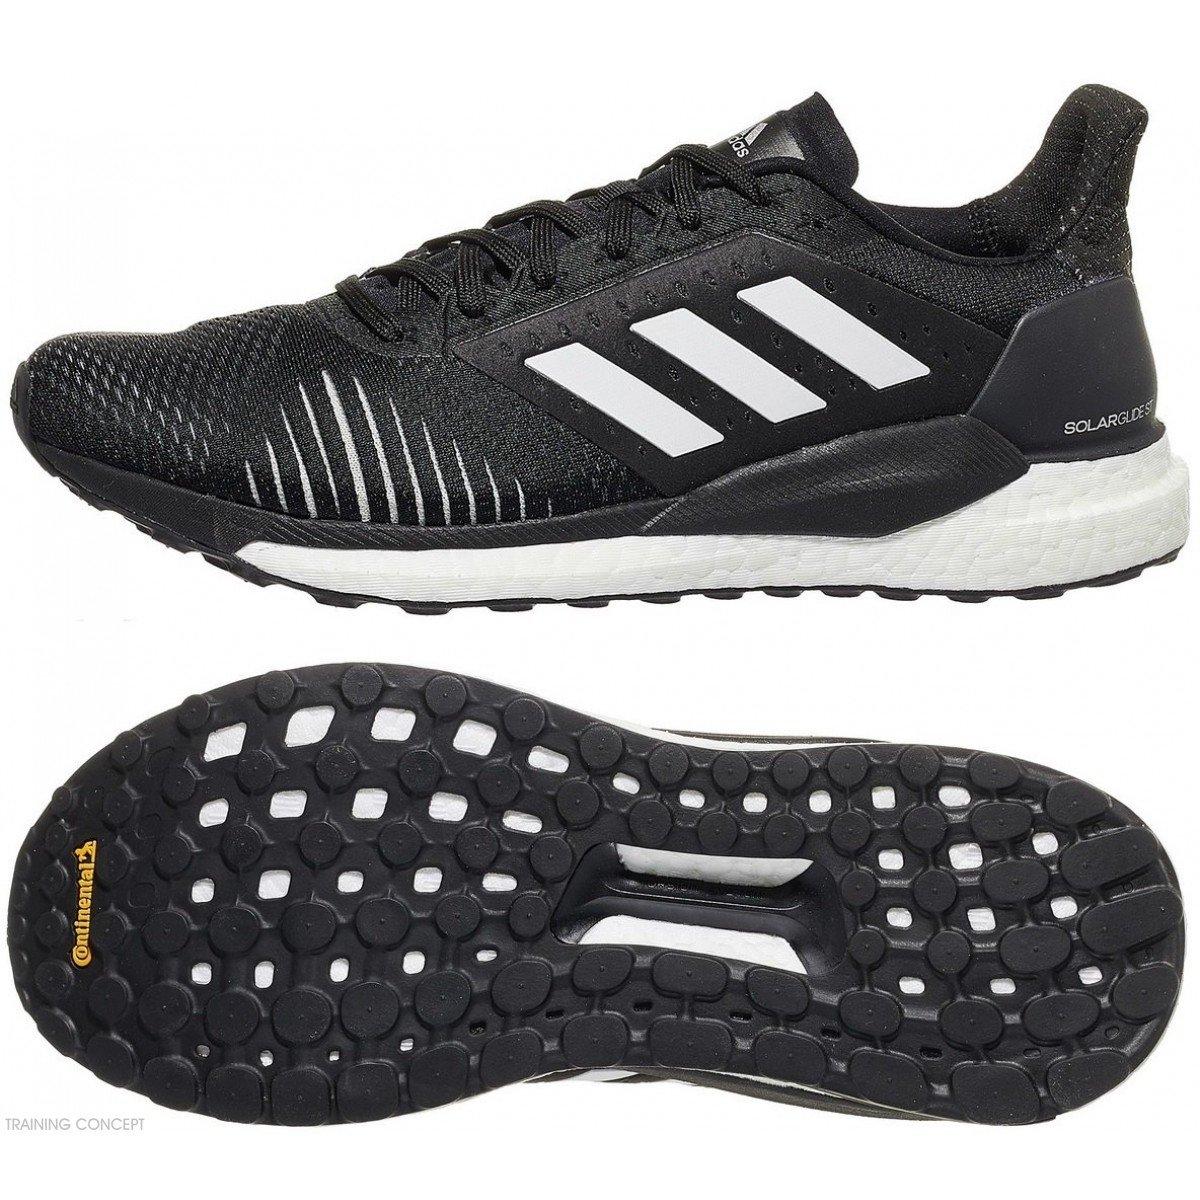 Chaussures Cq3178 Glide Pour Hommes Adidas Running St De Solar Black 0PnwOk8X